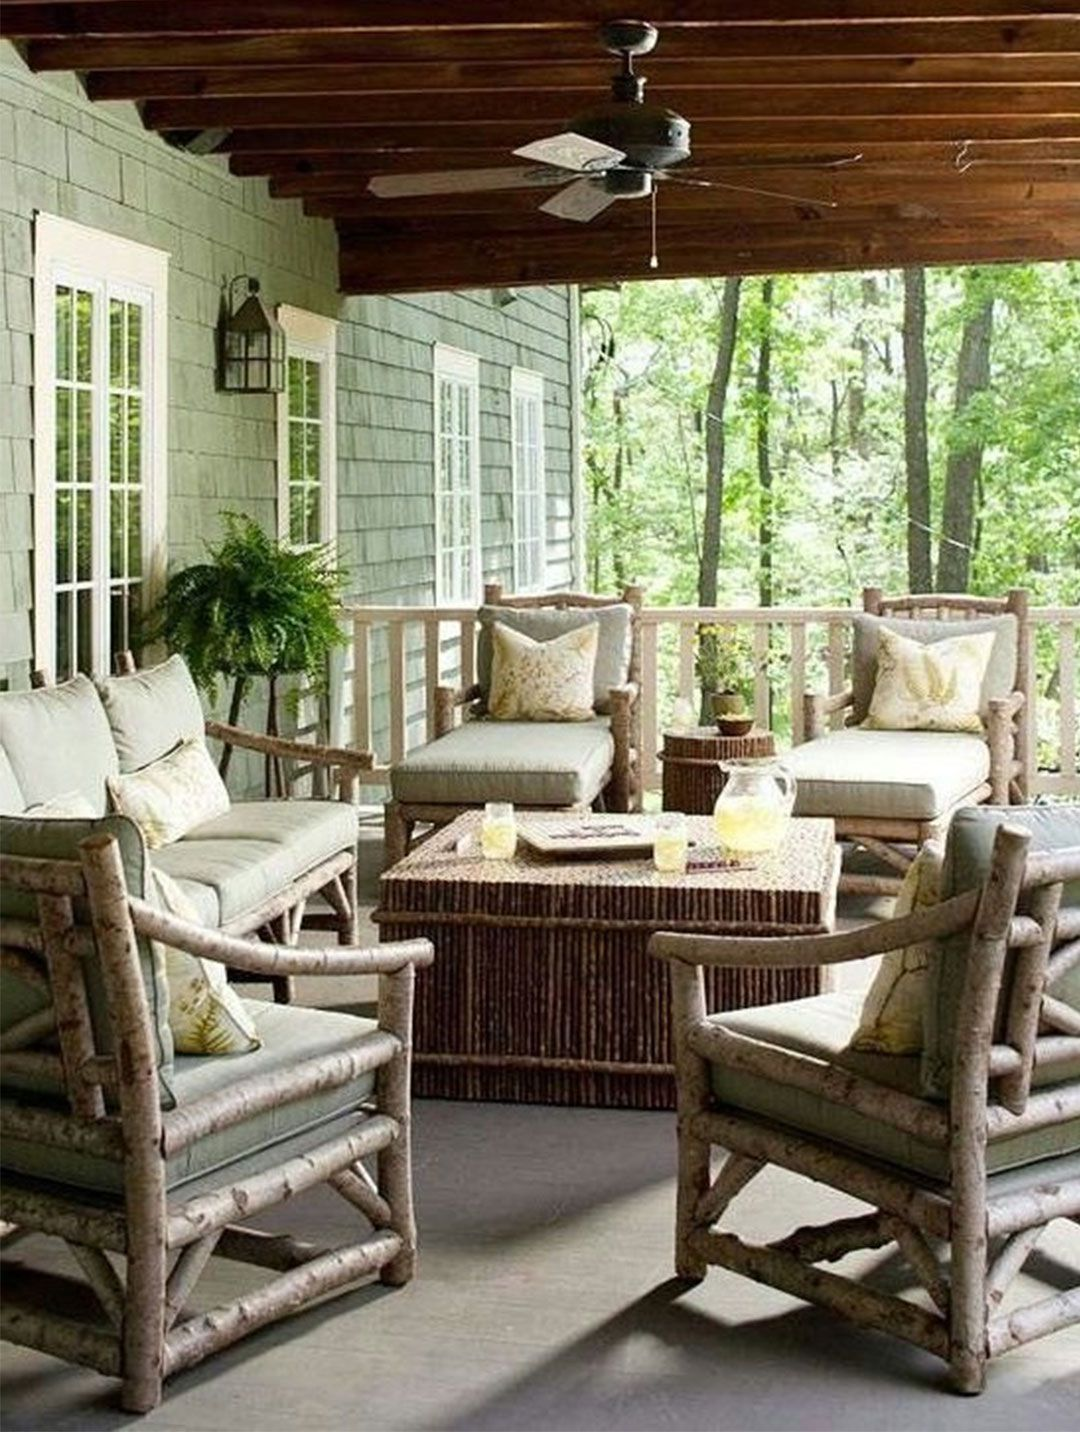 patio furniture design ideas Rustic outdoor furniture